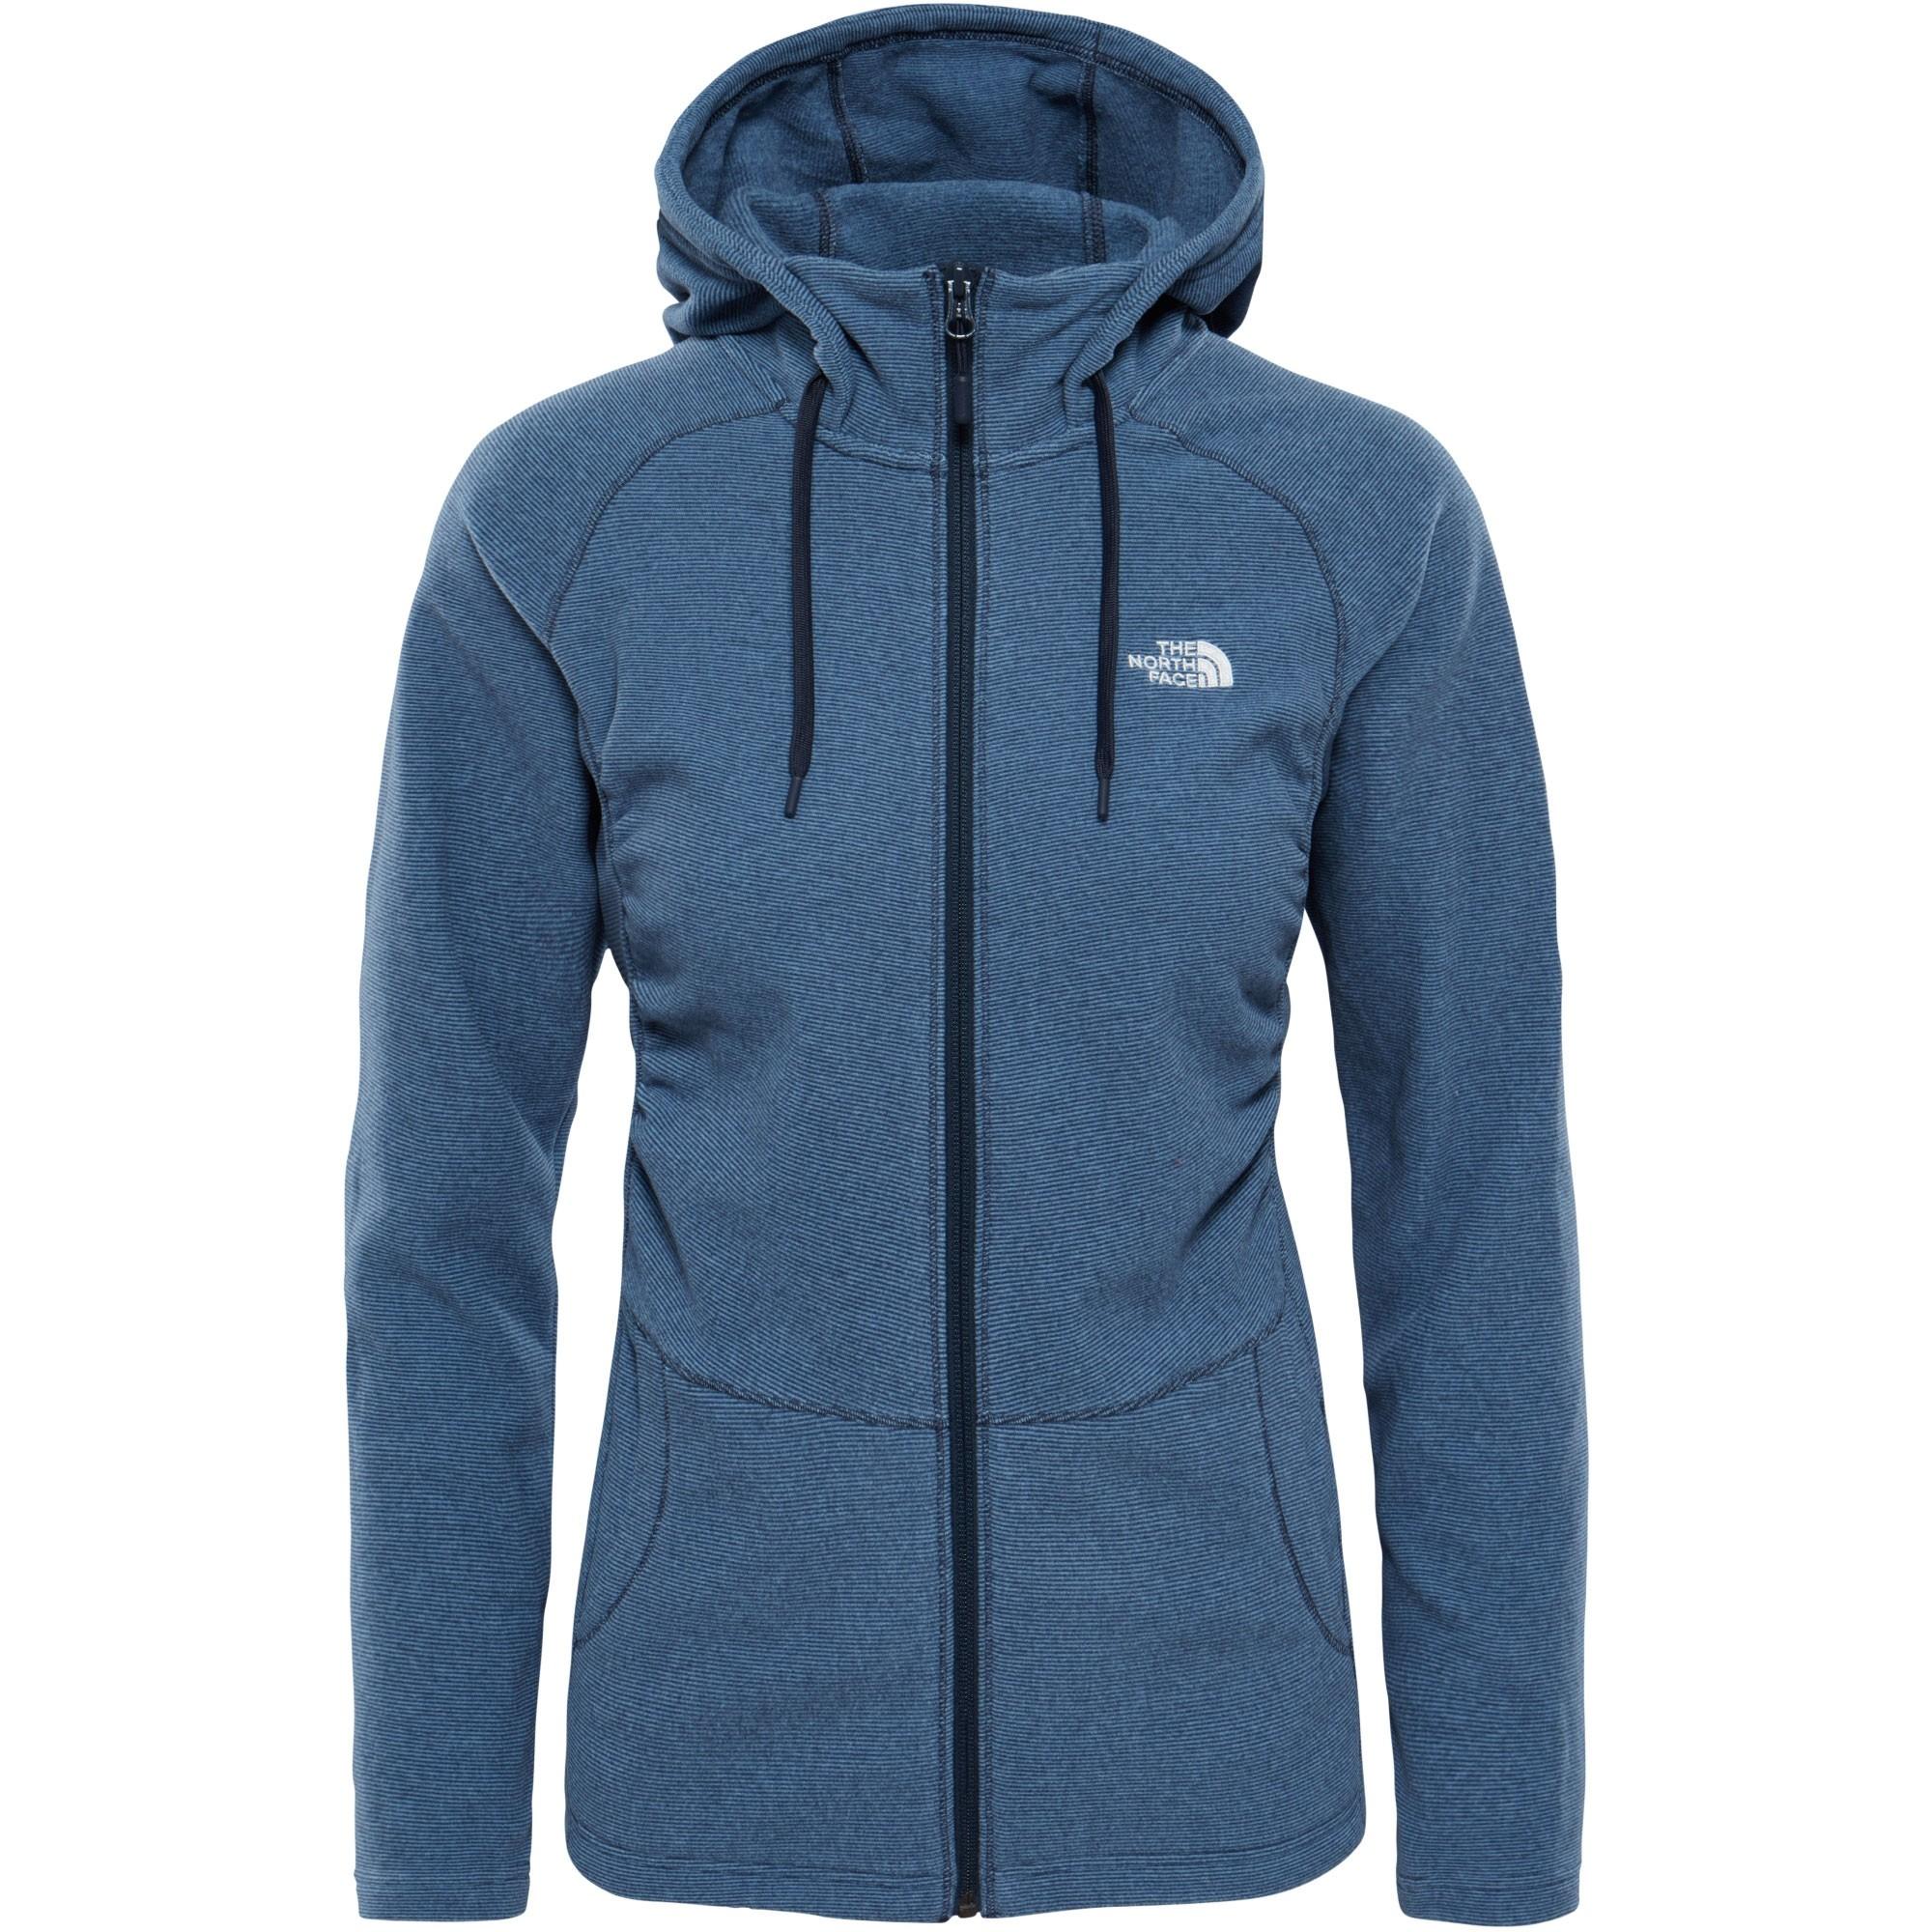 The-North-Face-Womens-Mezzaluna-Full-Zip-Hoodie-Provincial-Blue-Stripe-0-W17